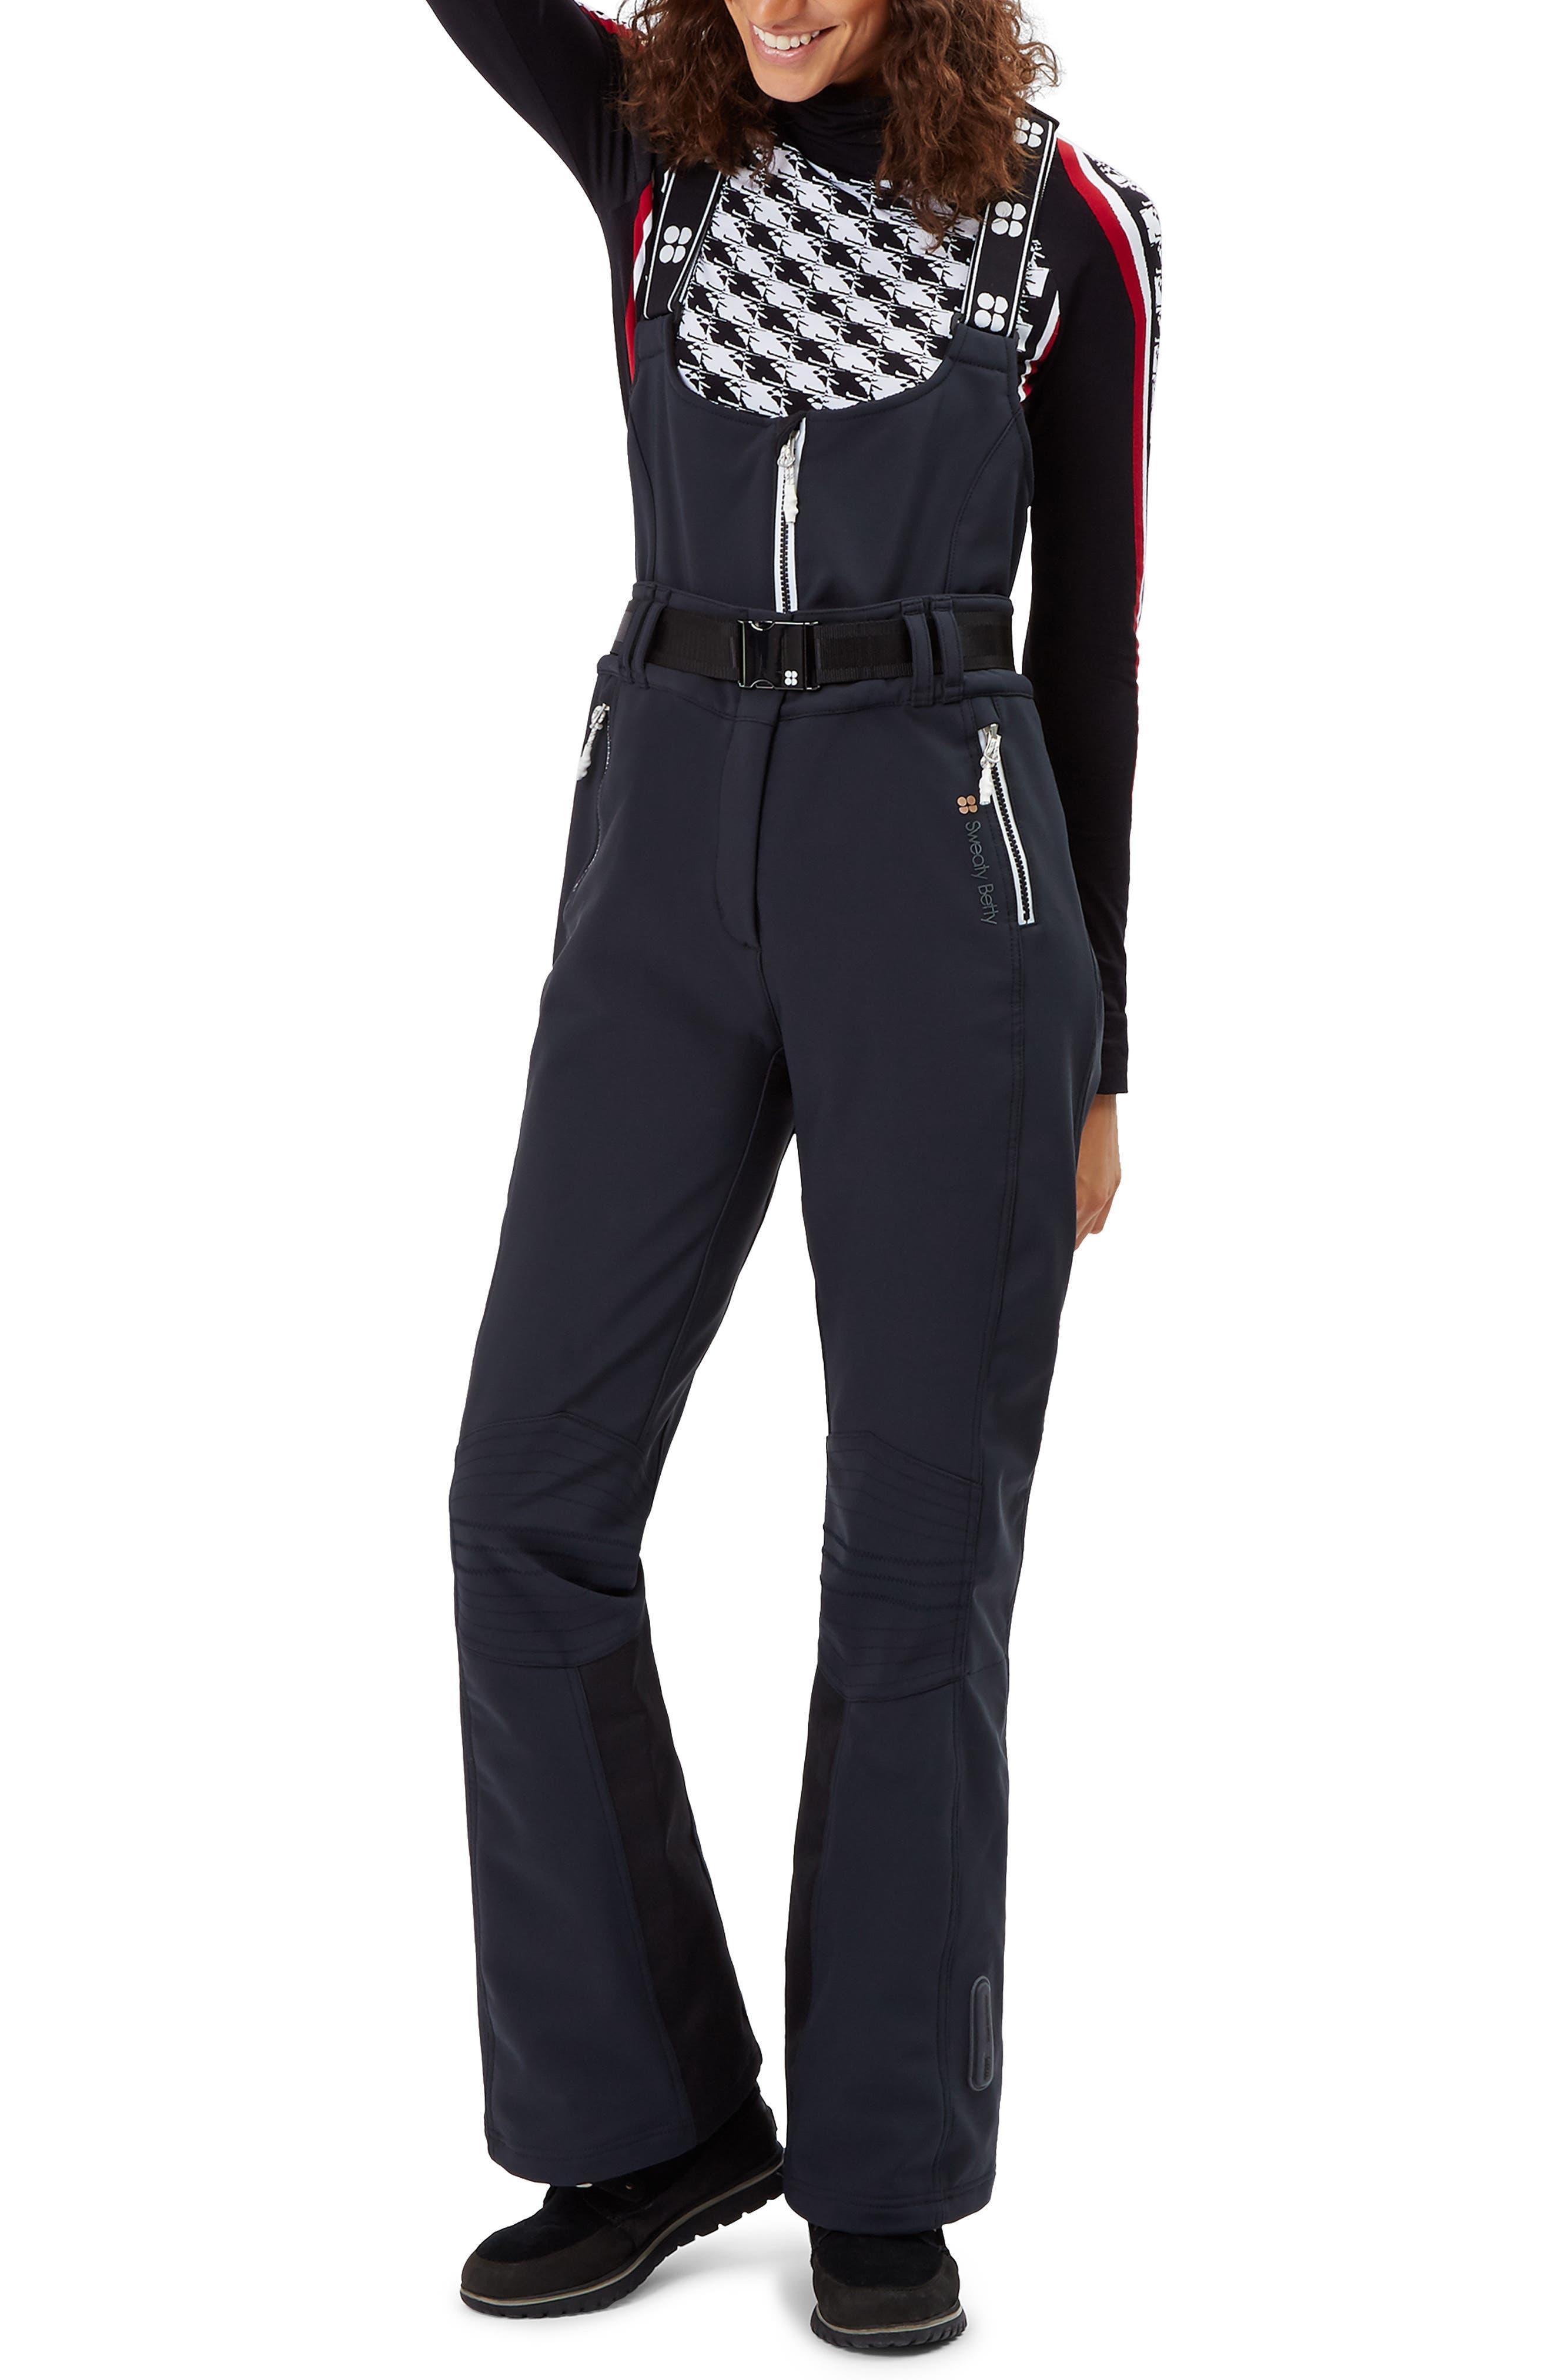 Astro Waterproof Soft Shell Ski Pants,                         Main,                         color, BLACK